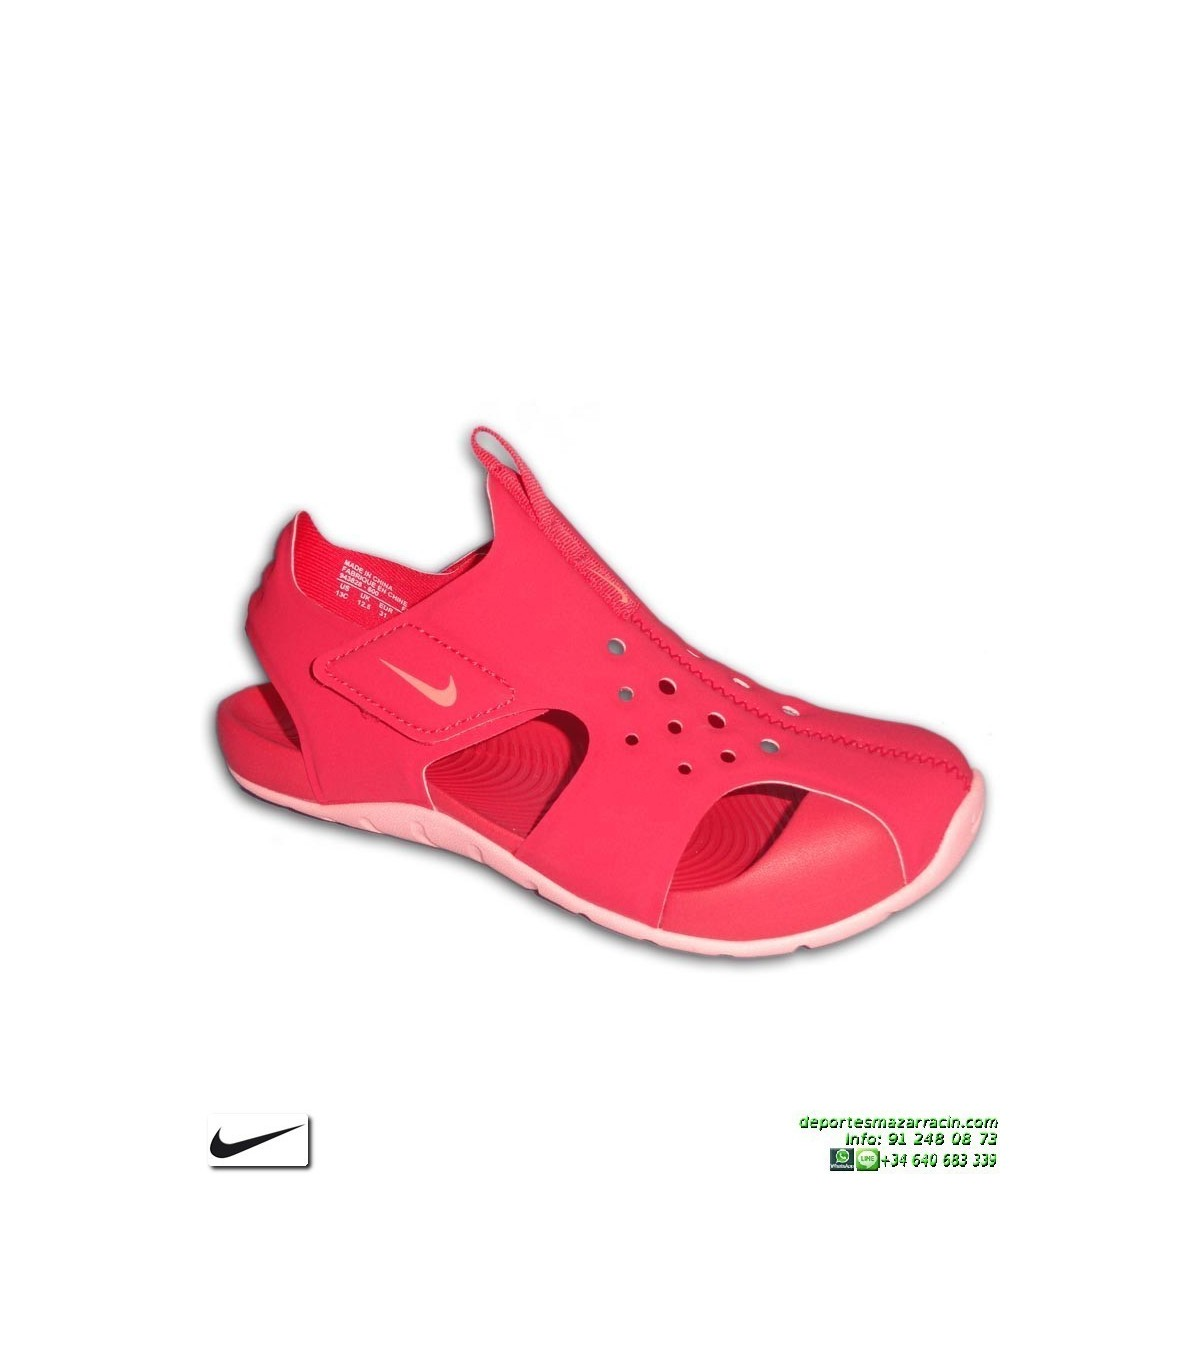 0b12899227d ... Sandalia Nike SUNRAY PROTECT 2 Niña Rosa PS 28-35 · Sandalia ...